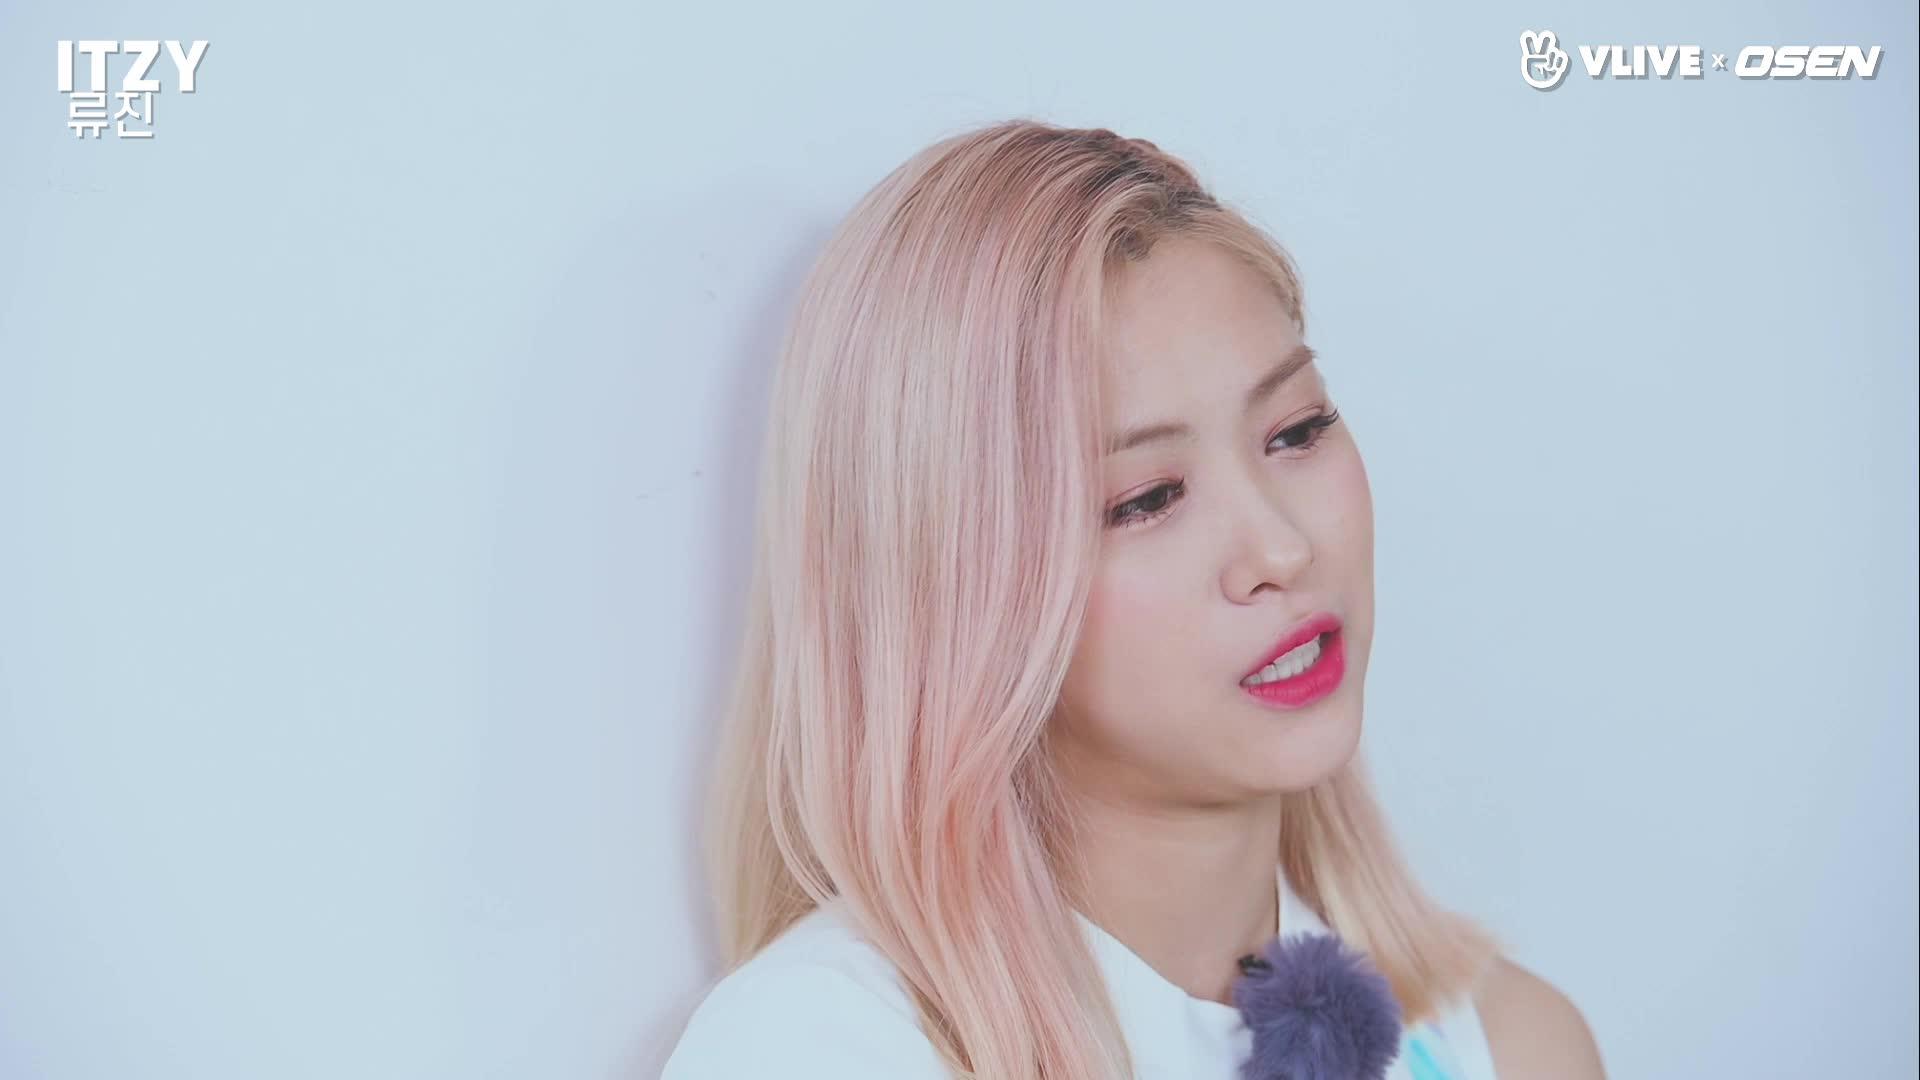 ITZY 류진, 진정한 멋쁨 '륮땡' #스타로드 하이라이트